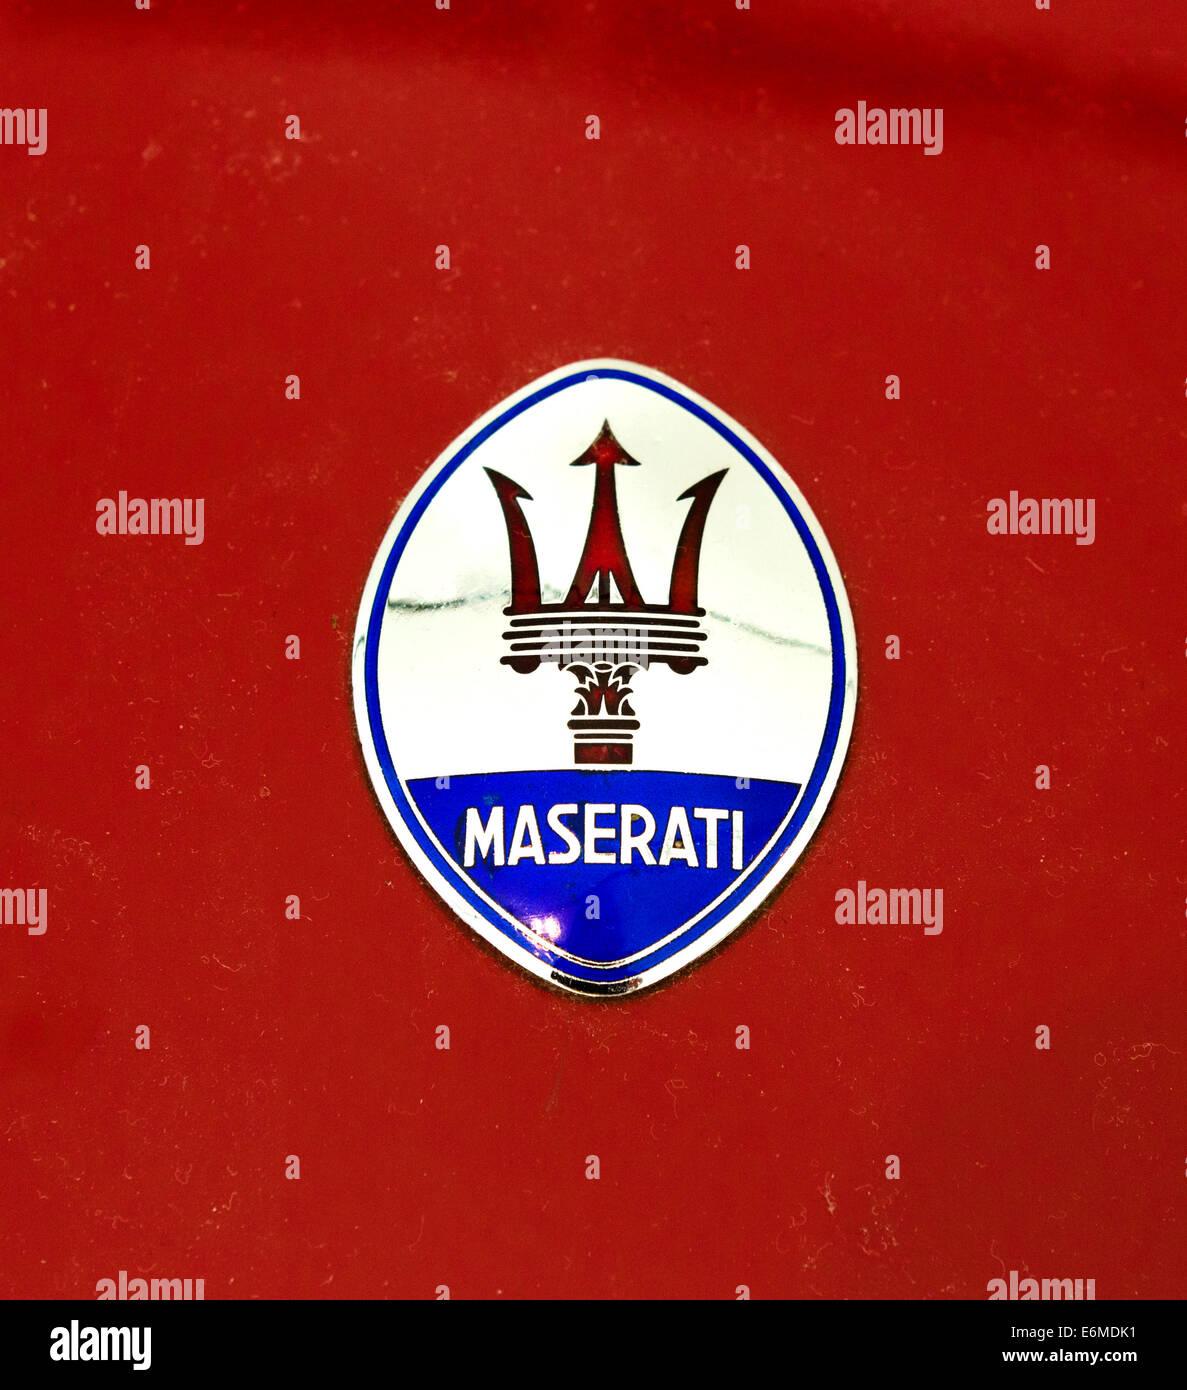 Maserati badge on a racing car in the Museo Enzo Ferrari, Modena, Italy - Stock Image